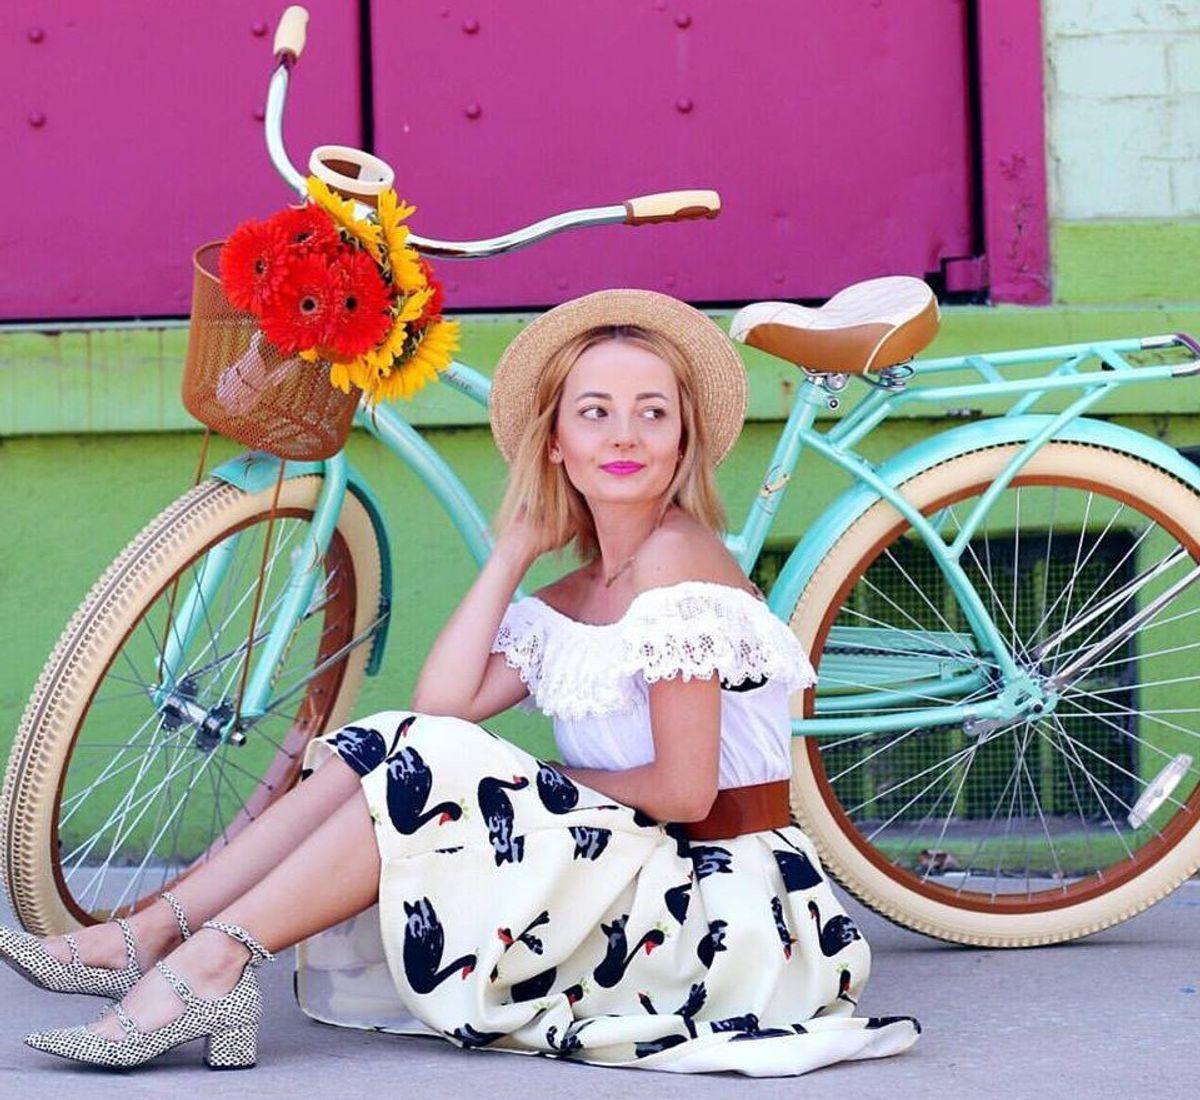 The Phenomenon Of Denver Fashion Bloggers